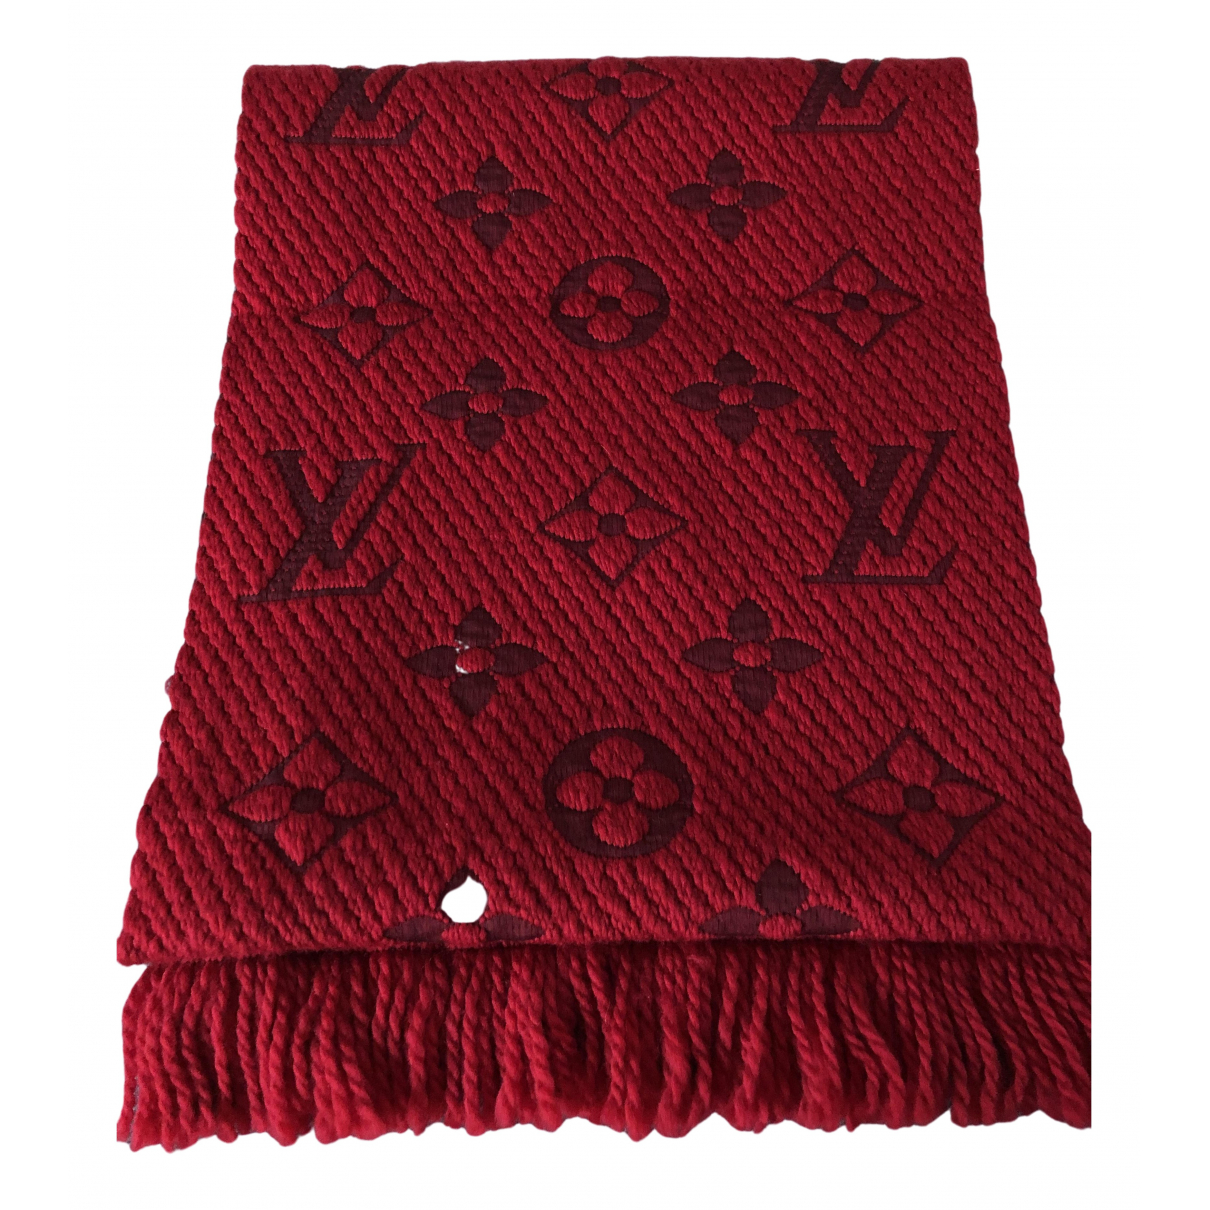 Louis Vuitton Logomania Red Wool scarf for Women N